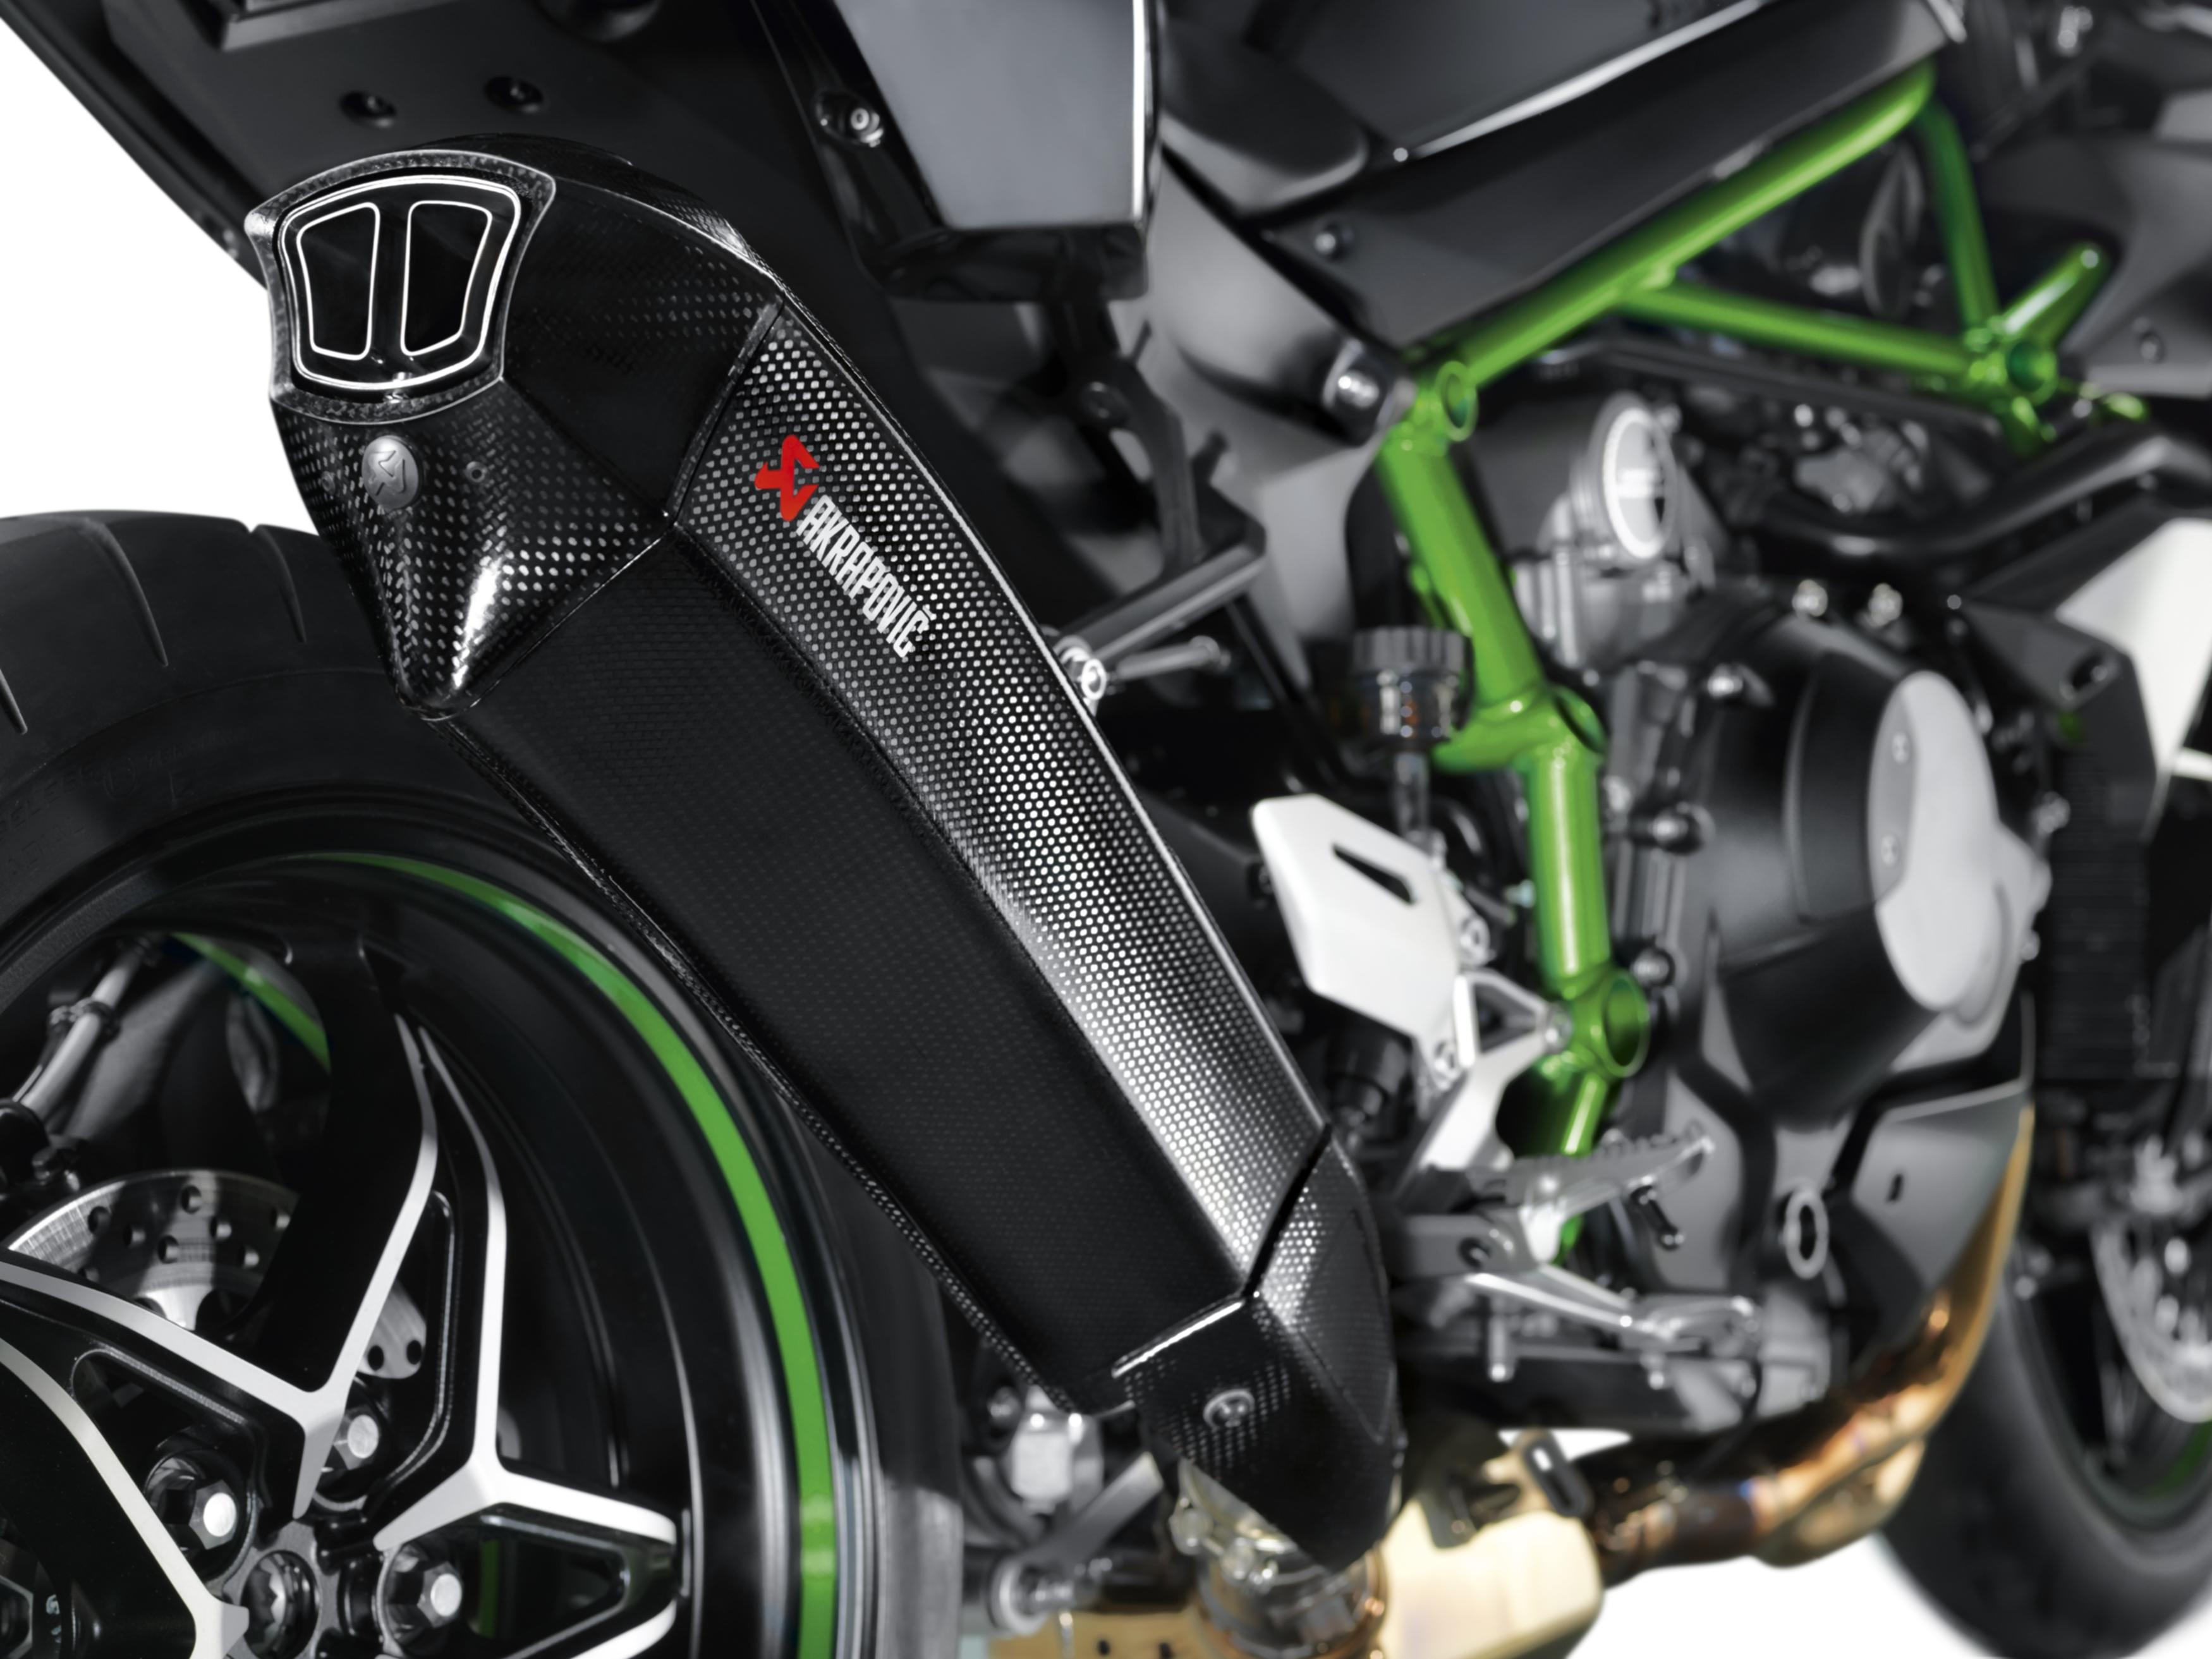 Kawasaki Ninja H2 UK price and final specs confirmed